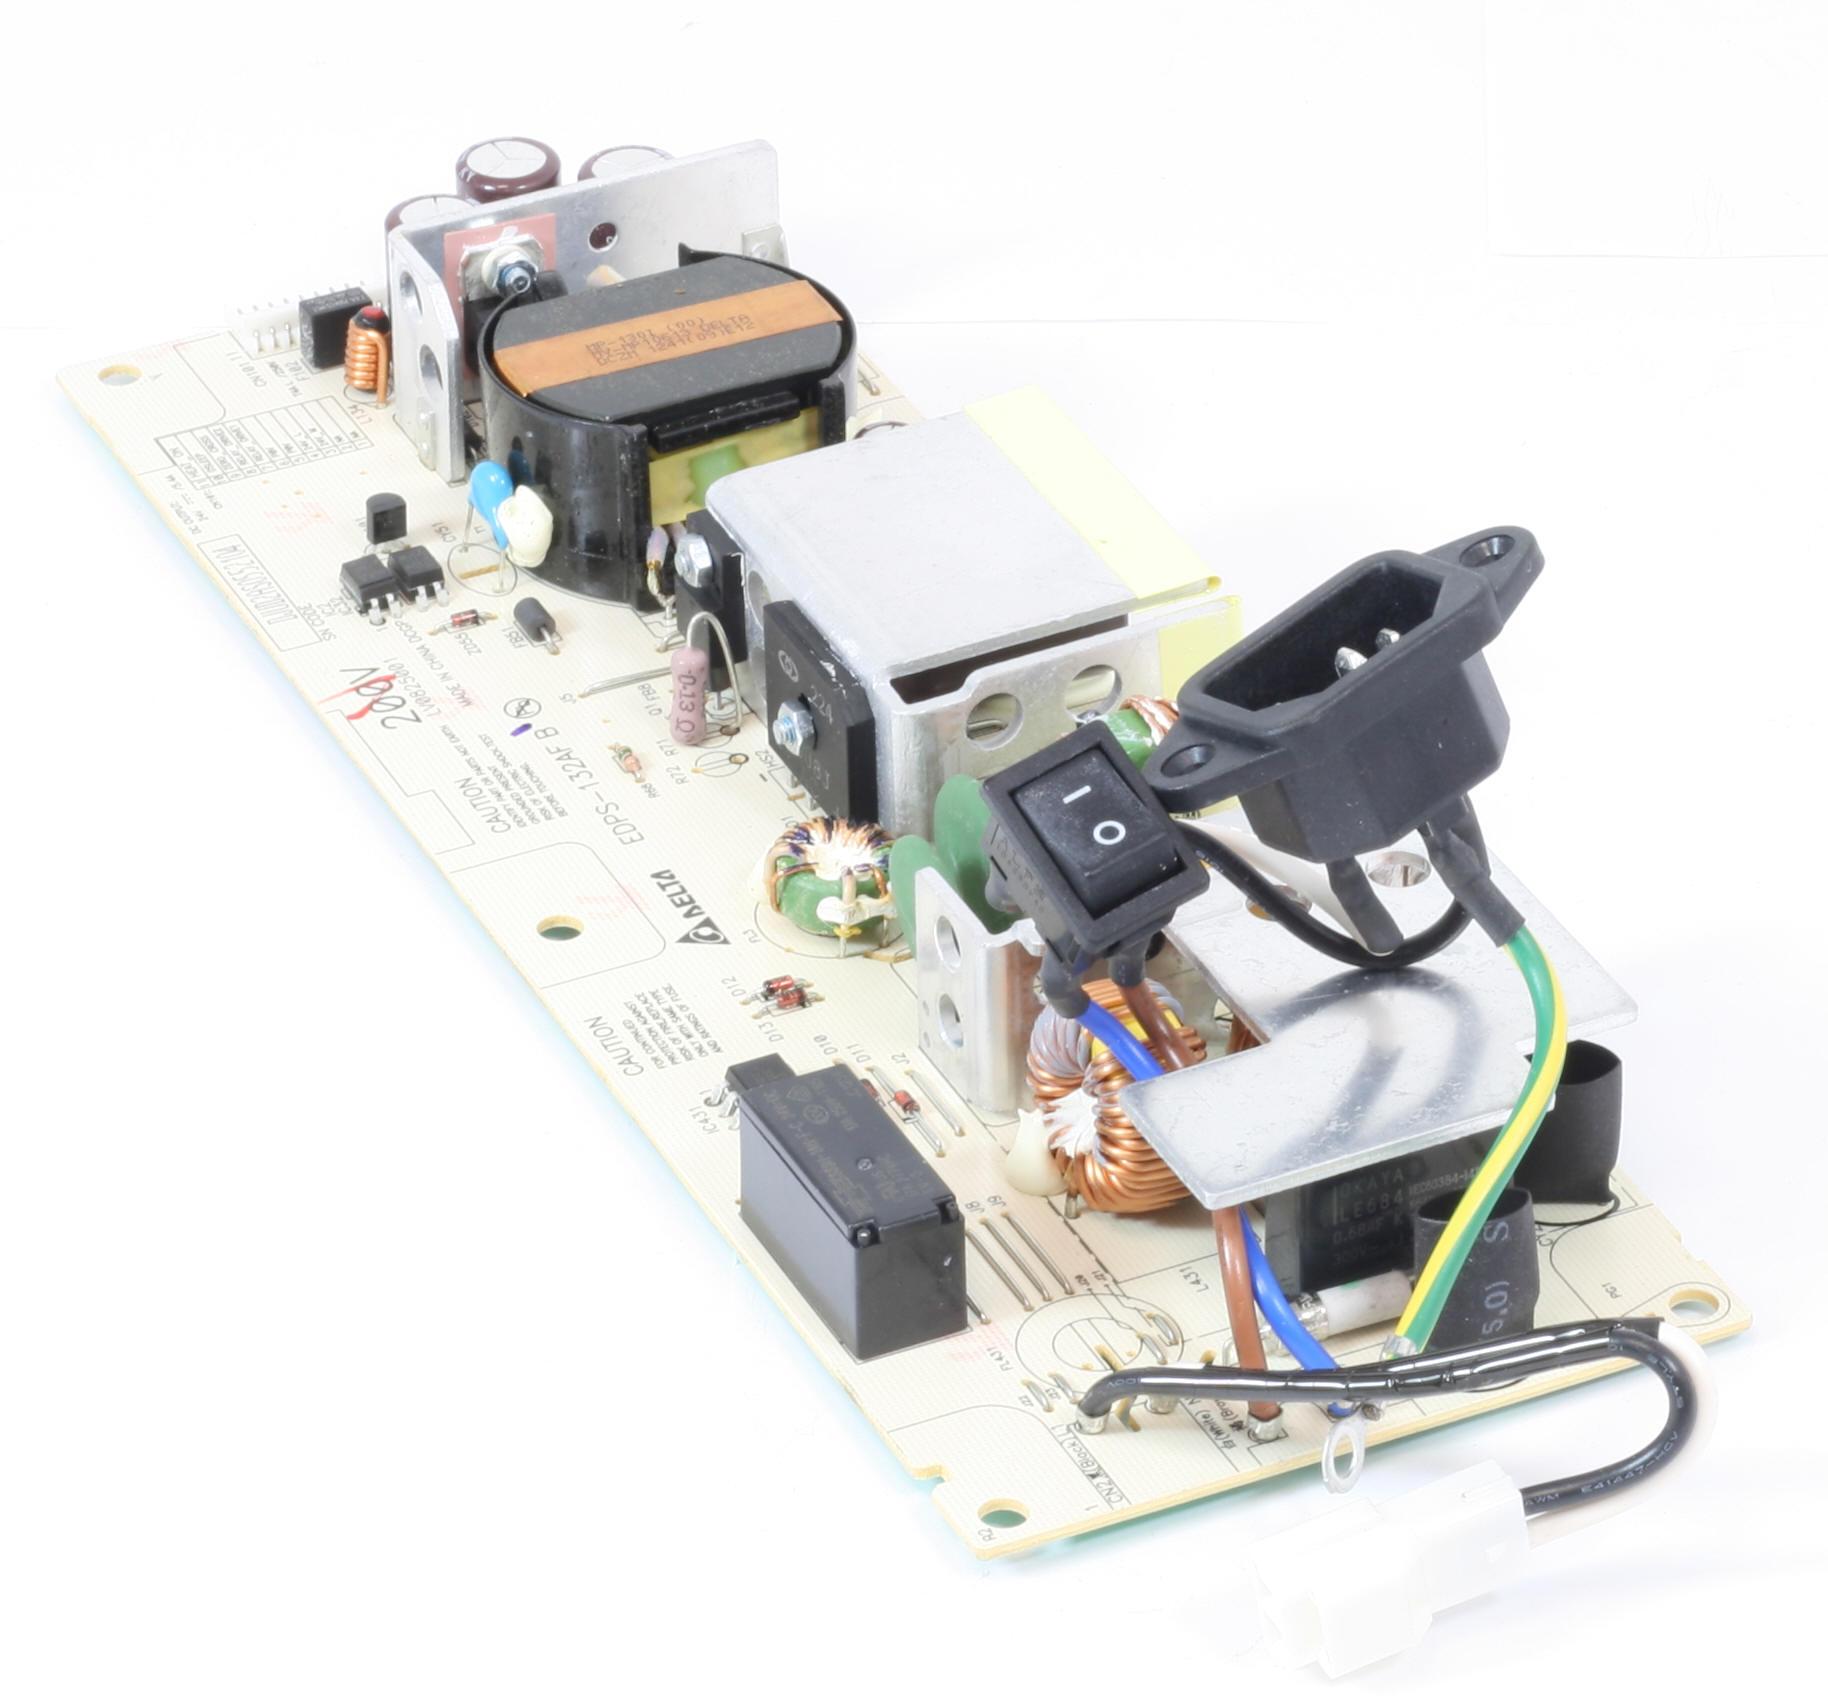 Brother Netzteil LV0825001 POWER SUPPLY EDPS-132AF HL-5450 DN HL-6180 DW gebraucht